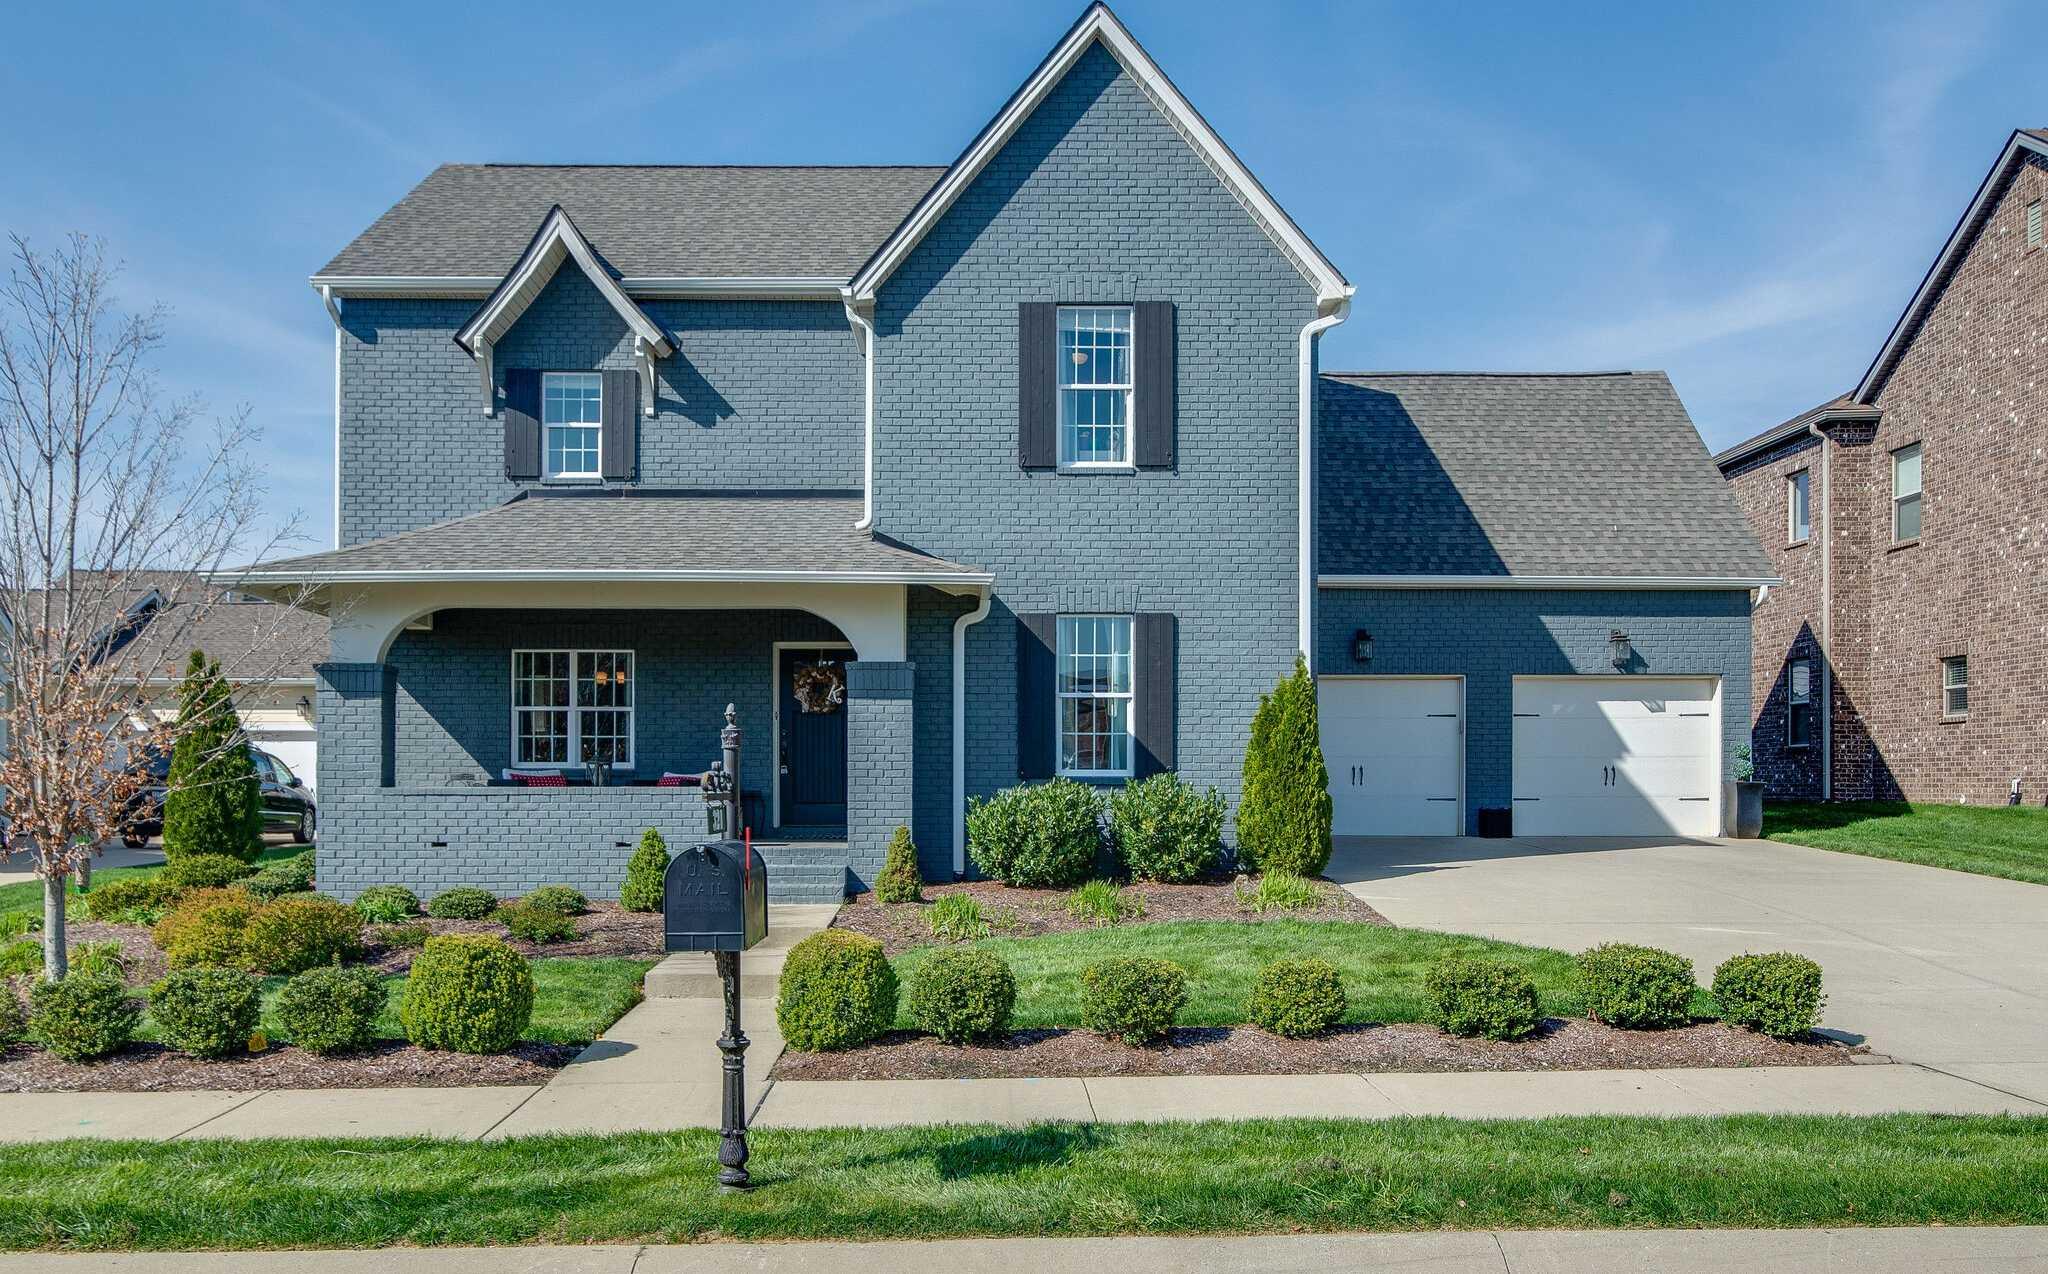 $655,000 - 5Br/3Ba -  for Sale in Jackson Hills Ph 1 Sec 1a, Mount Juliet